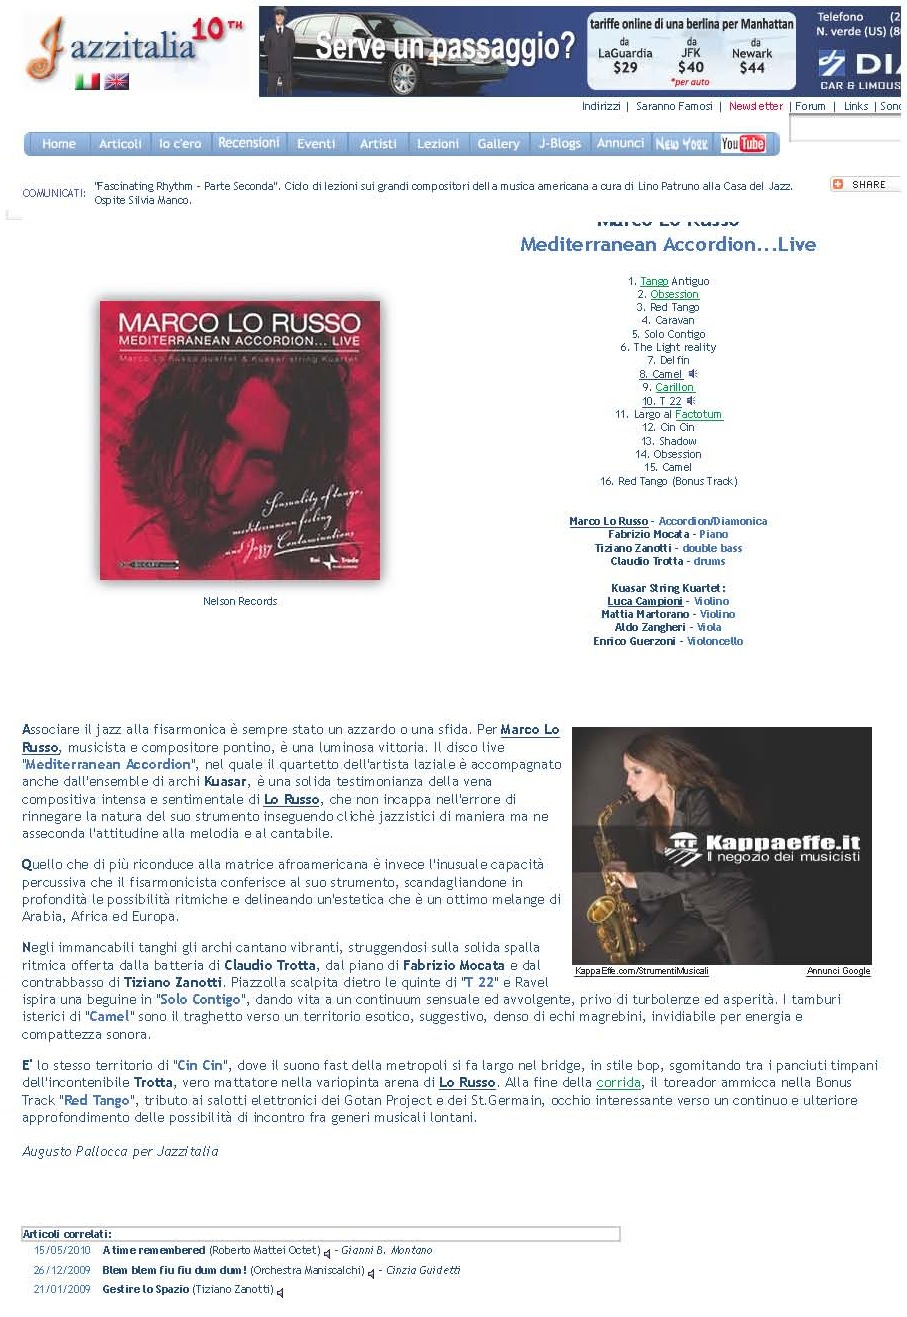 Jazzitalia Febbraio 2009 Augusto Pallocca Mediterranean Accordion by Marco Lo Russo